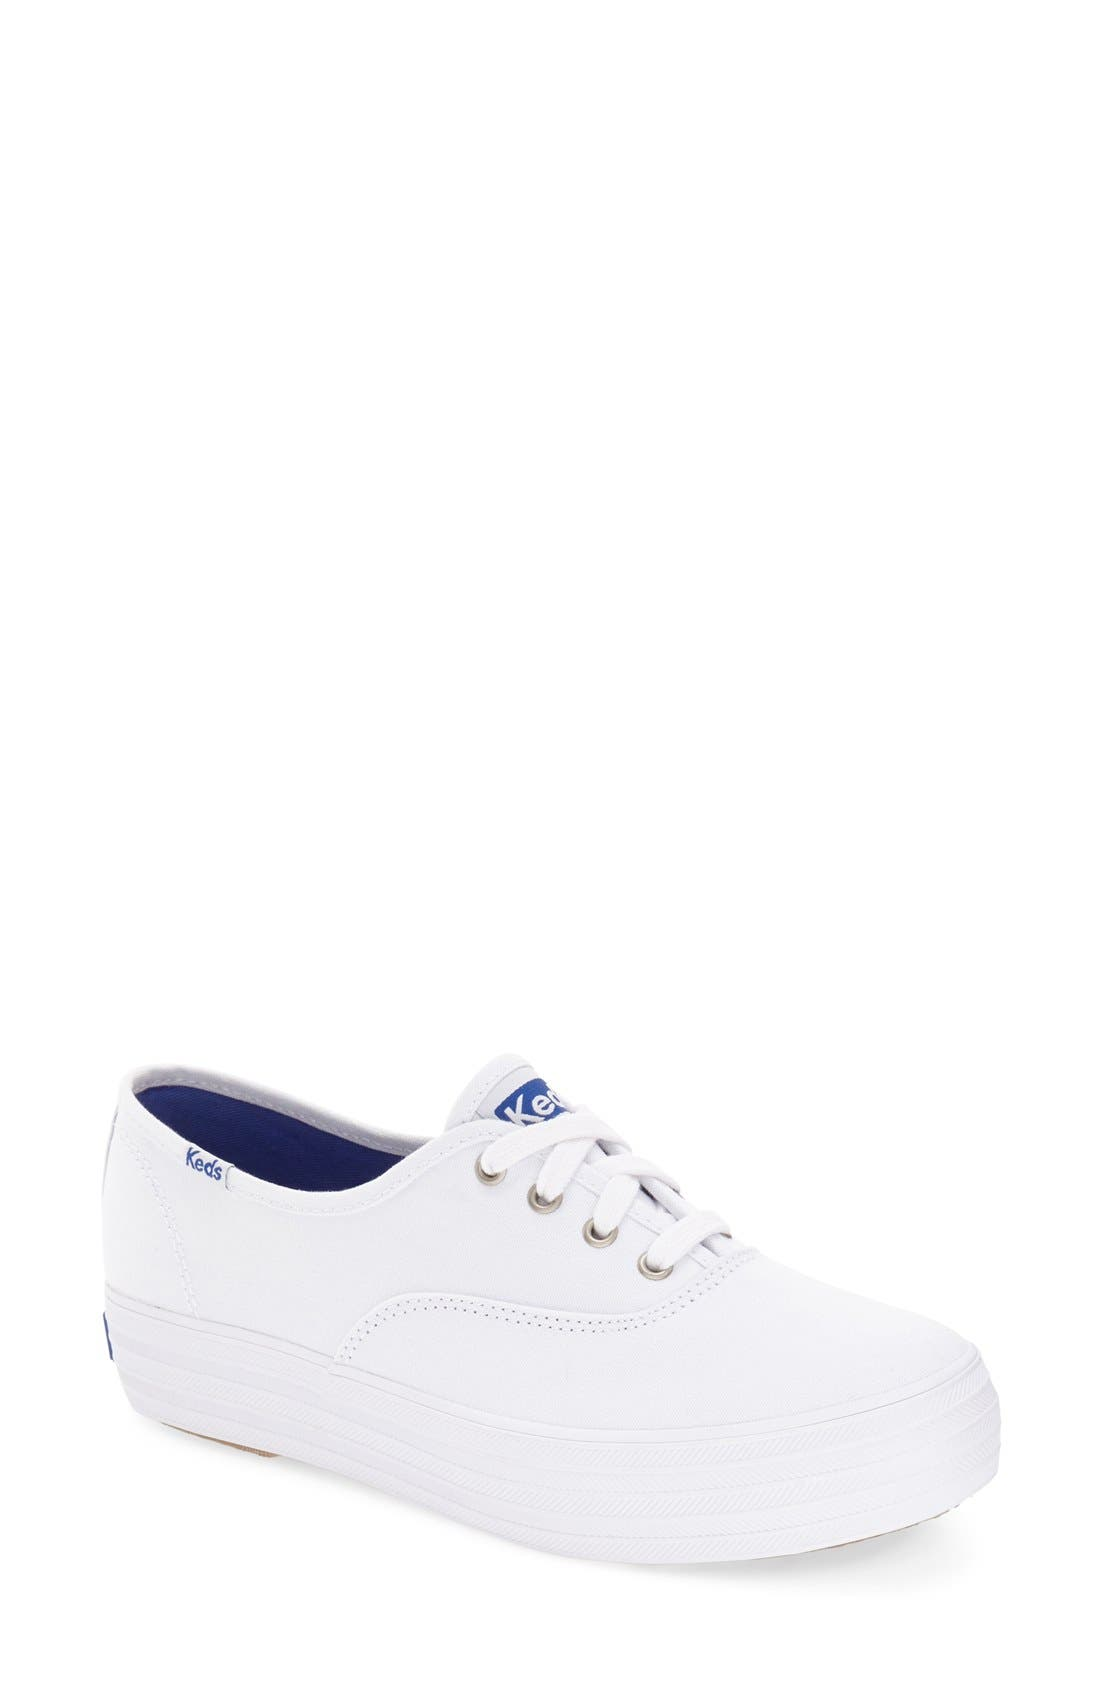 KEDS<SUP>®</SUP> Triple Core Sneaker